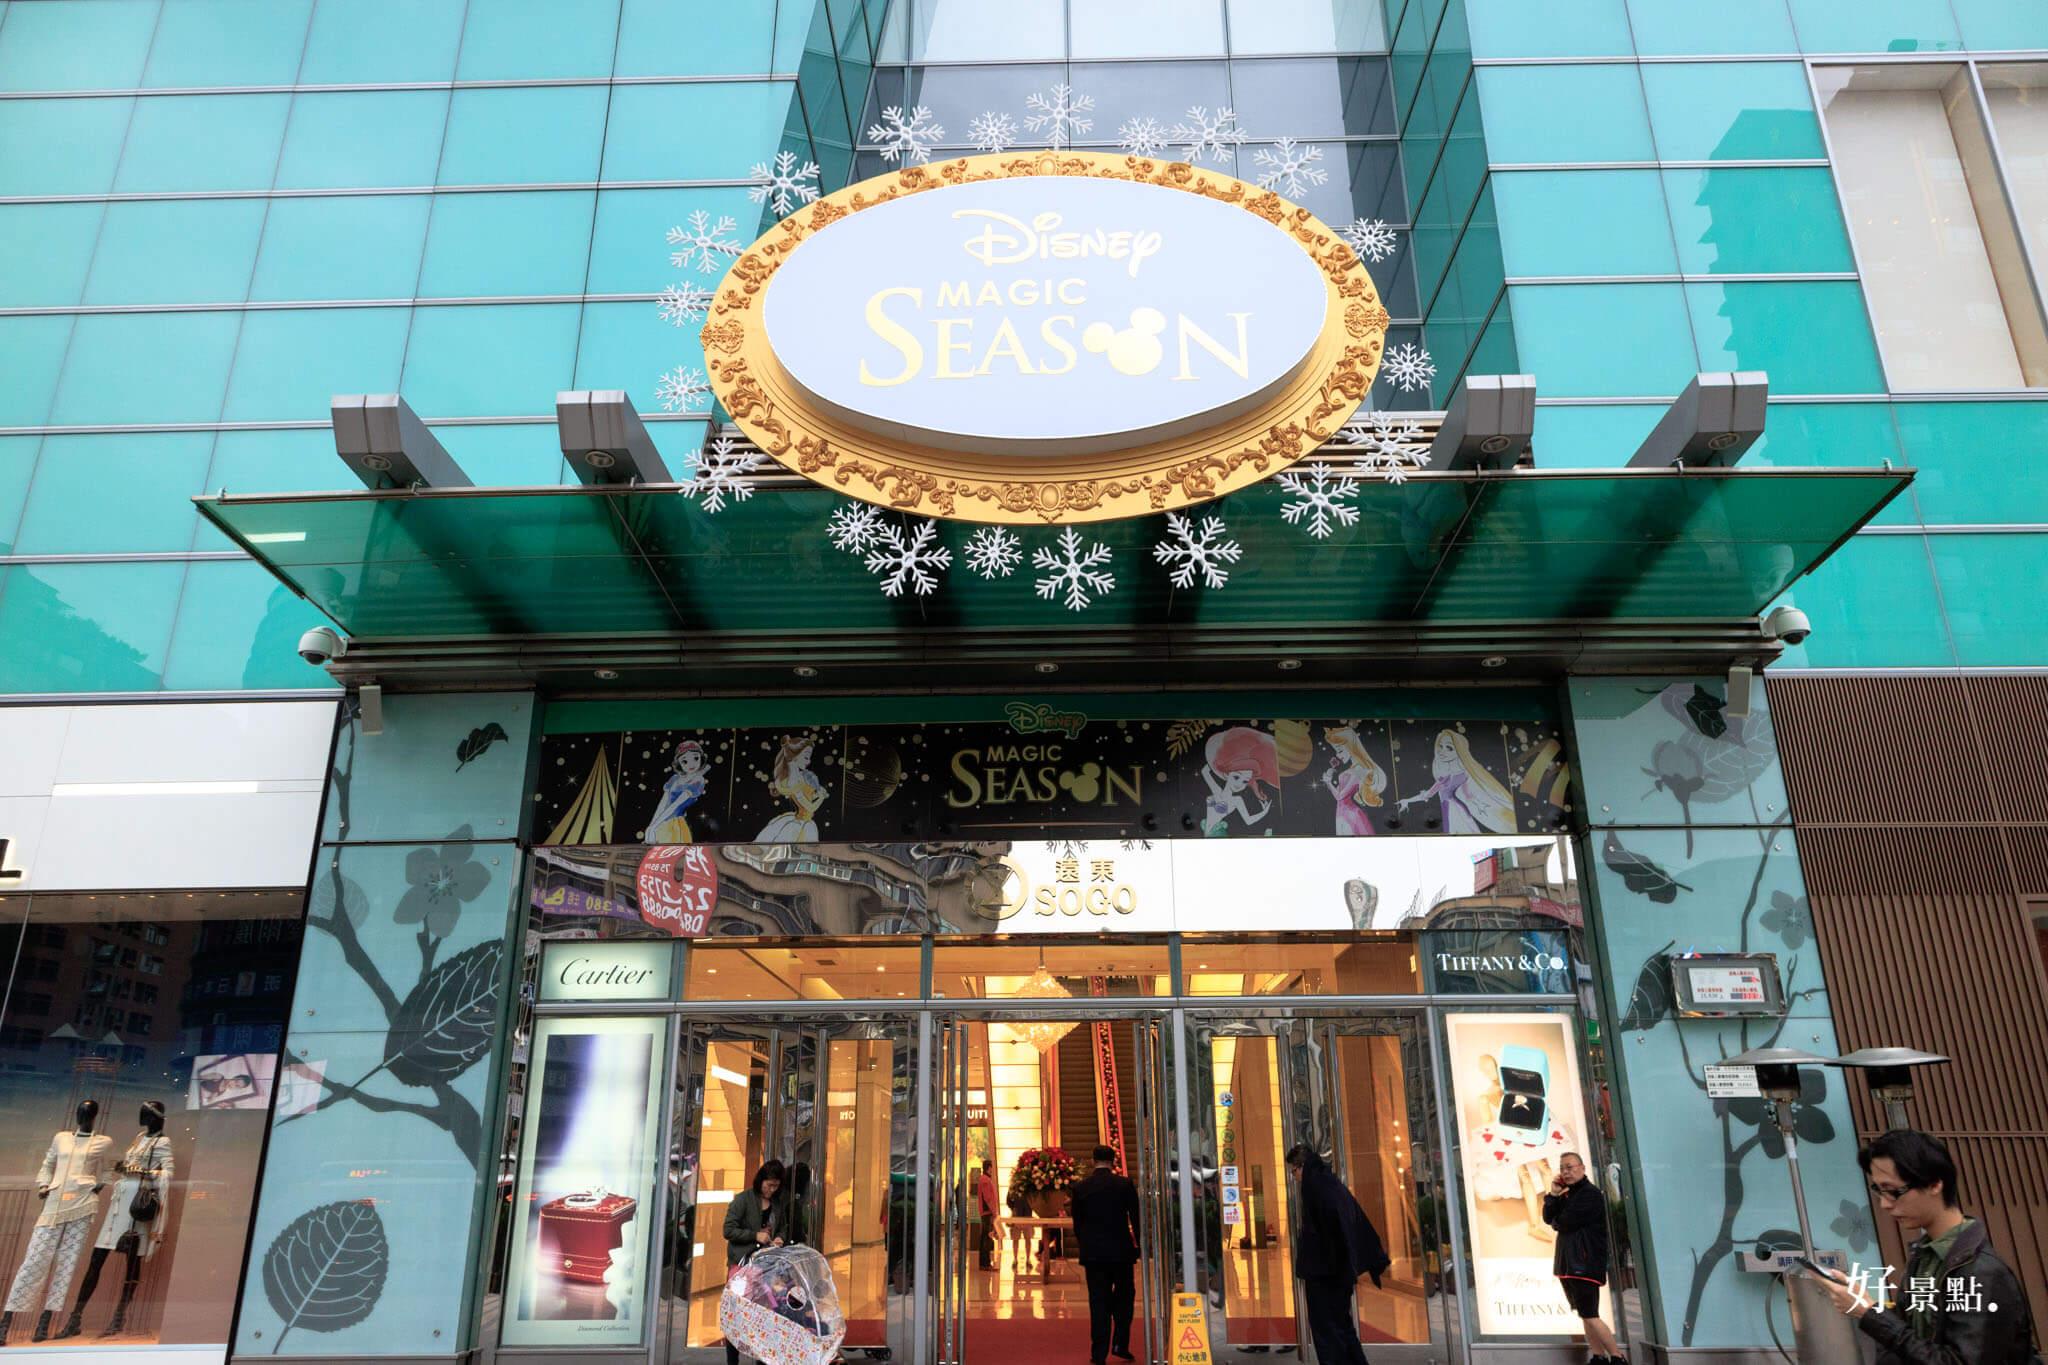 |SOGO百貨迪士尼聖誕節裝置|城堡、南瓜馬車、玻璃鞋超吸睛!